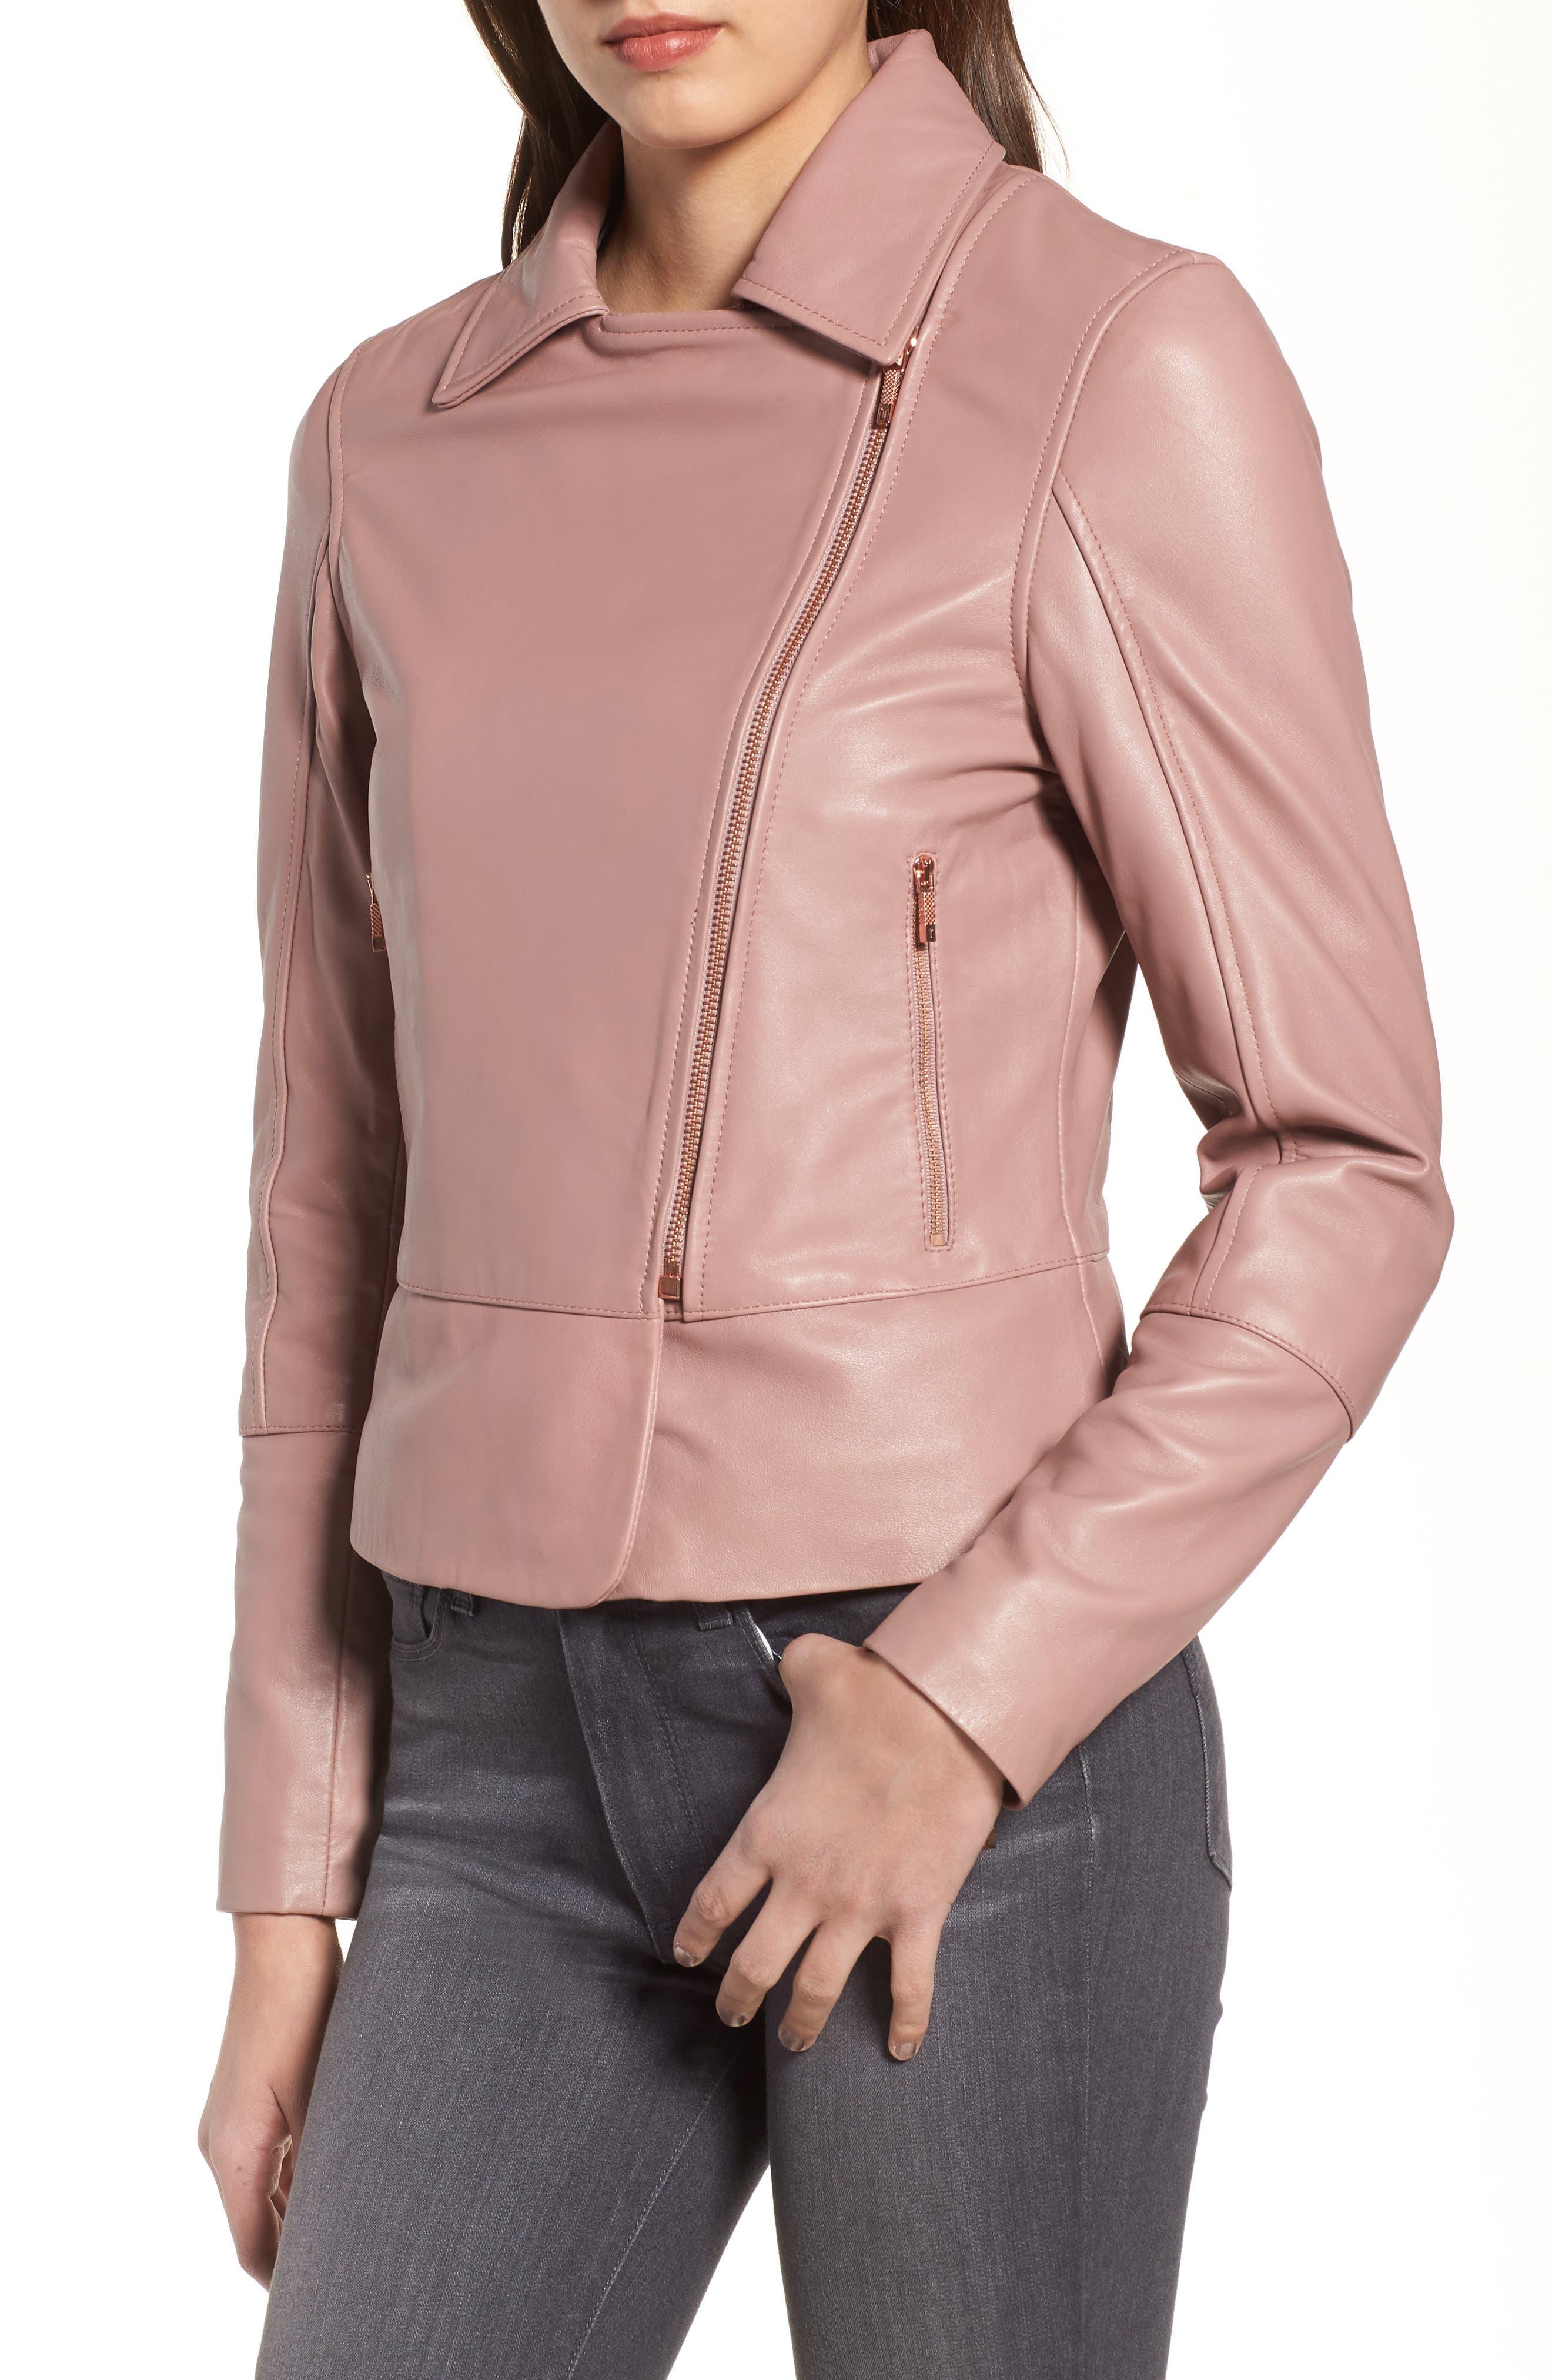 Lizia Leather Biker Jacket,                             Alternate thumbnail 4, color,                             Dusky Pink